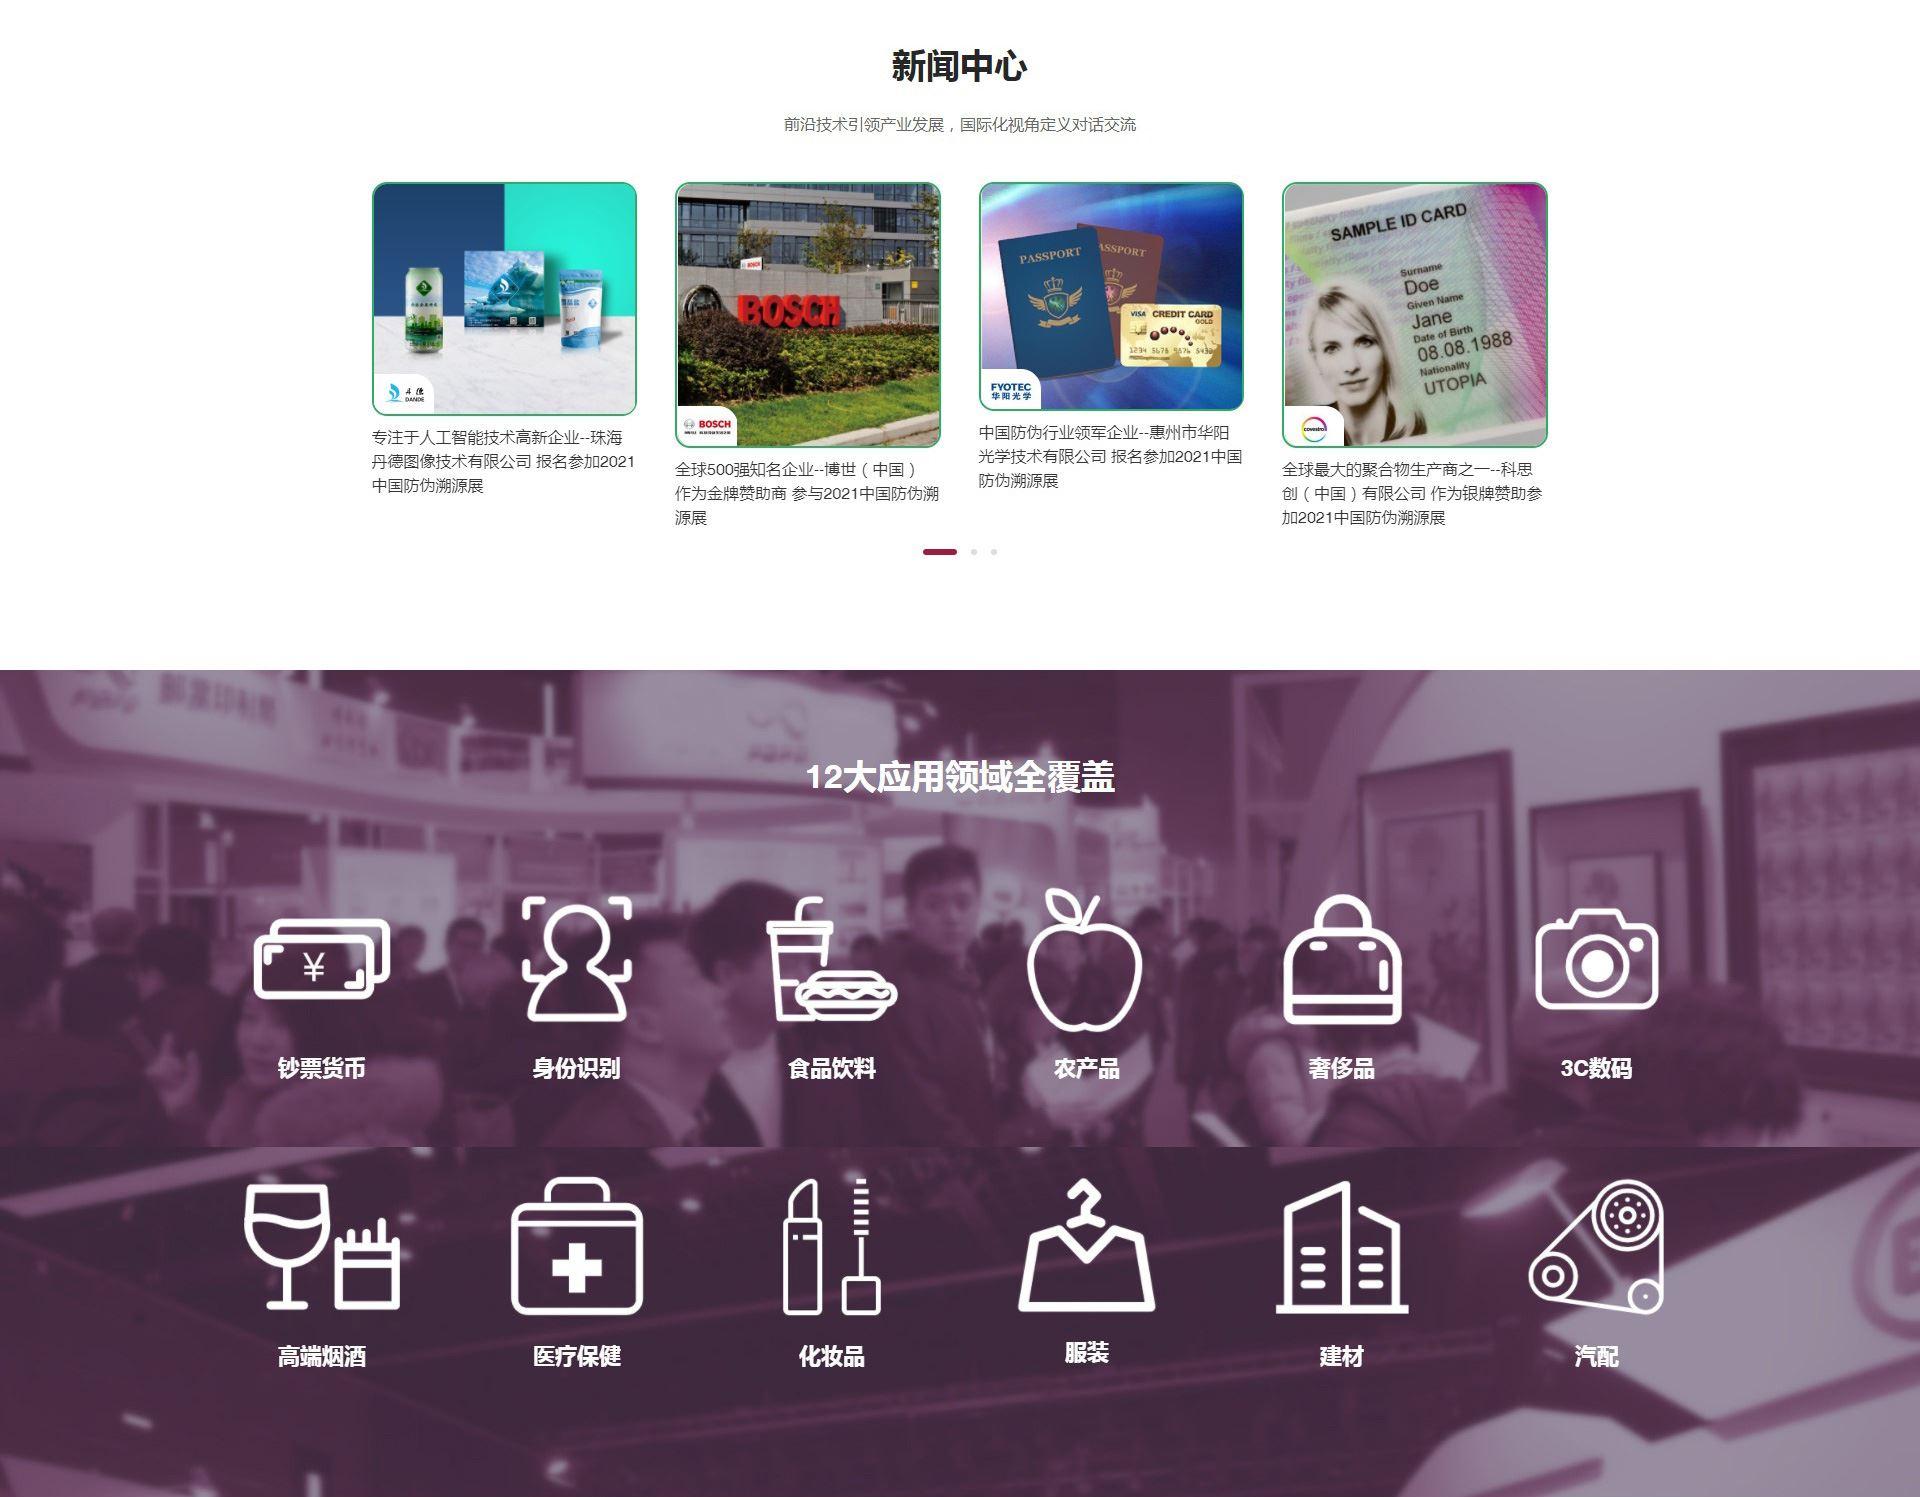 iBlackRedExhibition响应式展会官方网站定制